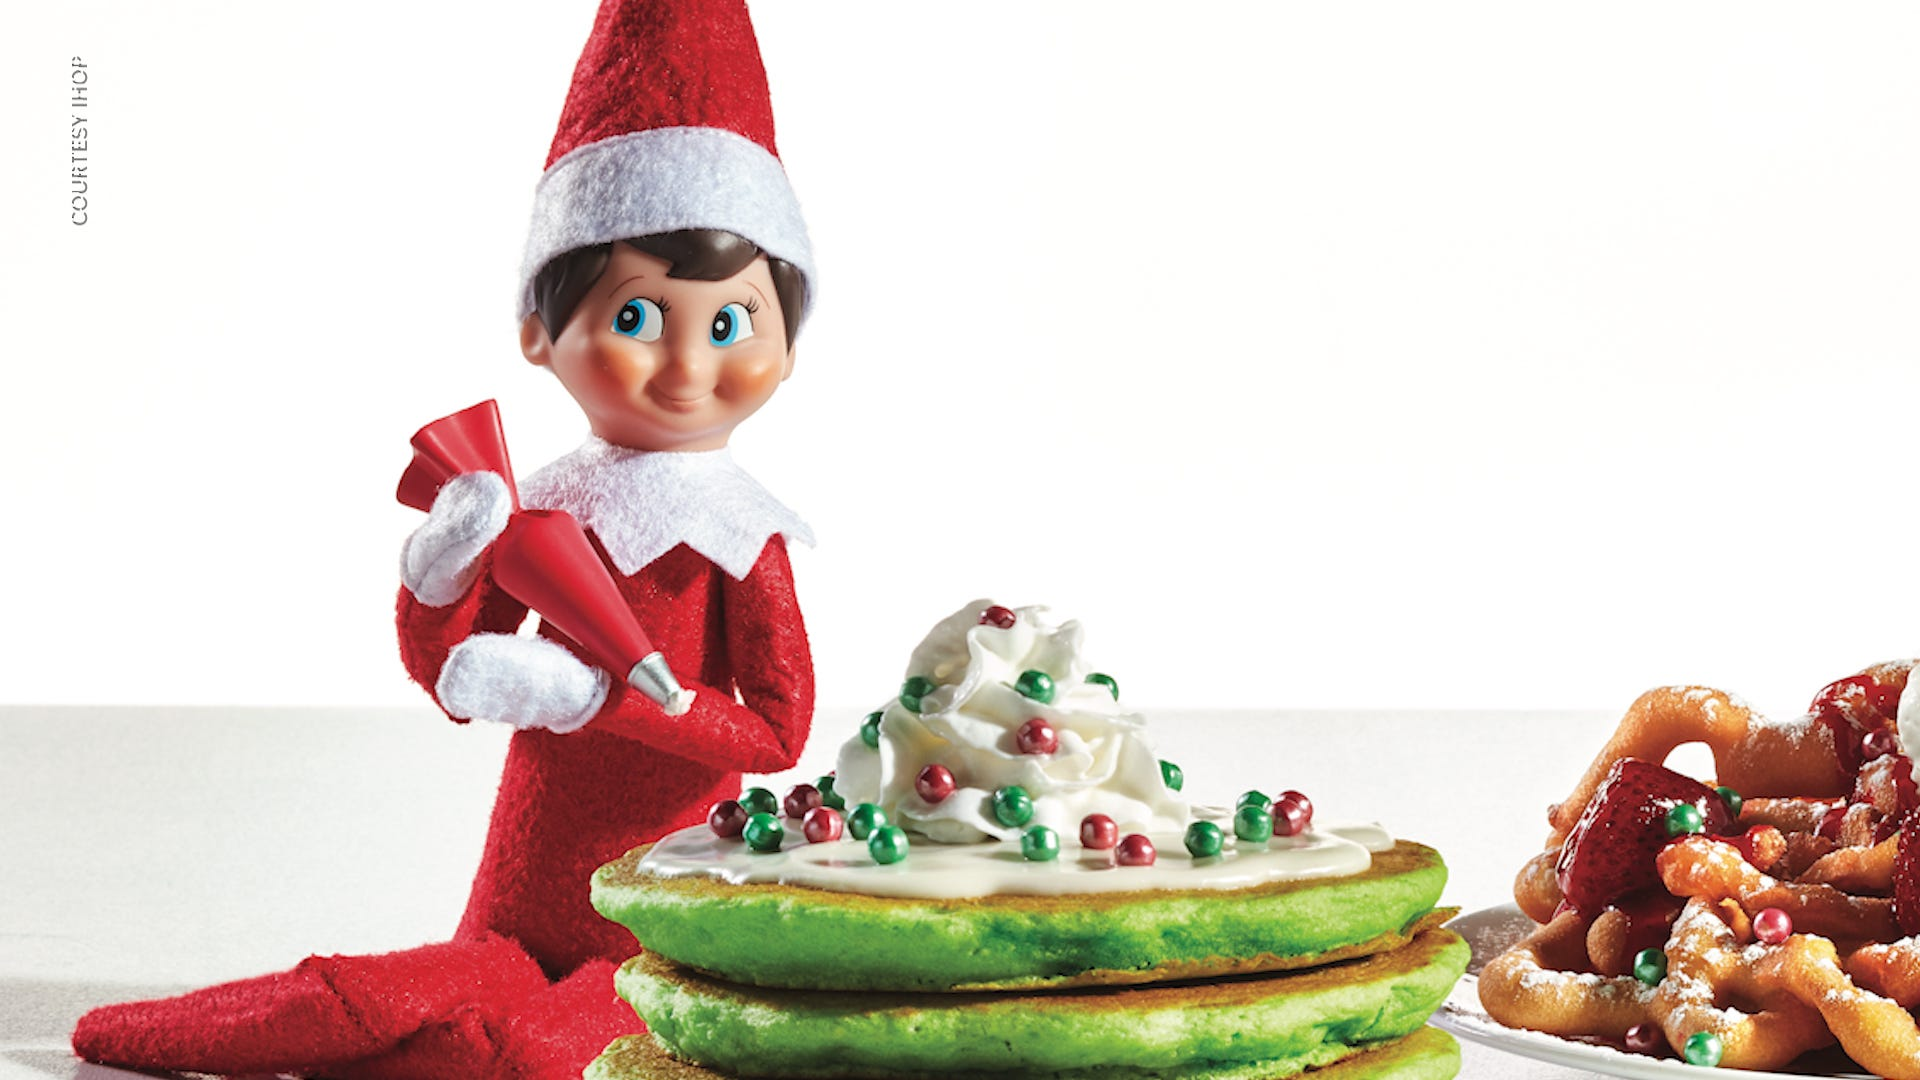 Christmas 2019 restaurants: Select McDonald's, Boston Market open